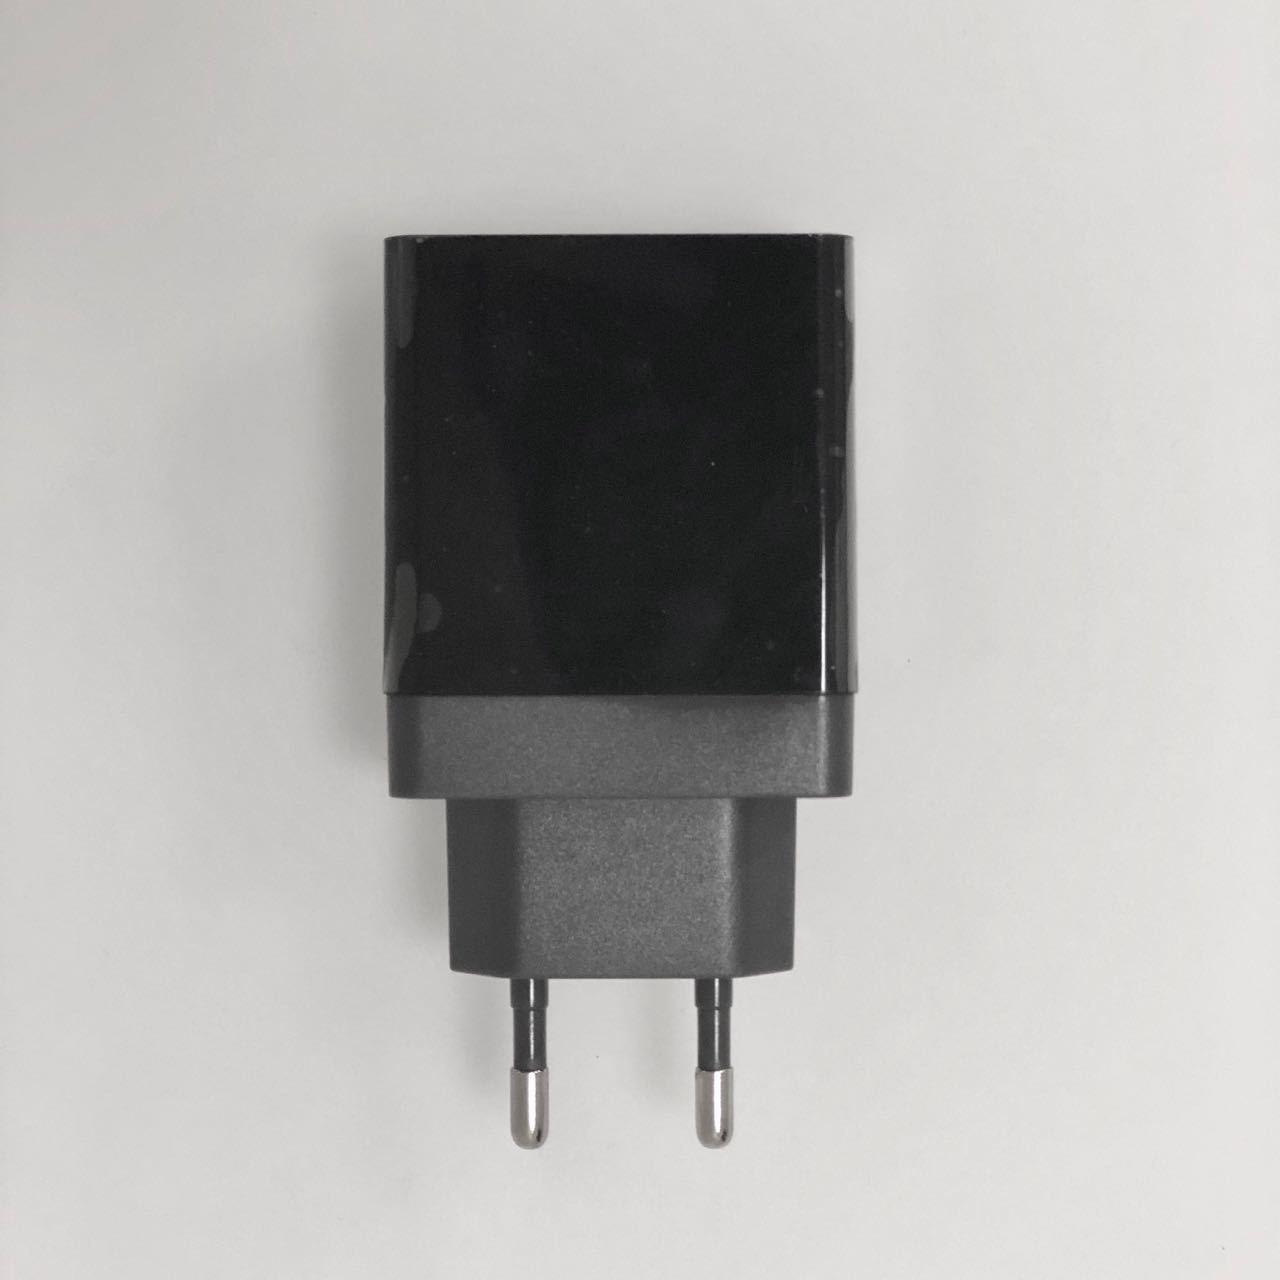 Адаптеры питания Сетевой адаптер Quick Charger 3.0 IMG_0535.jpg